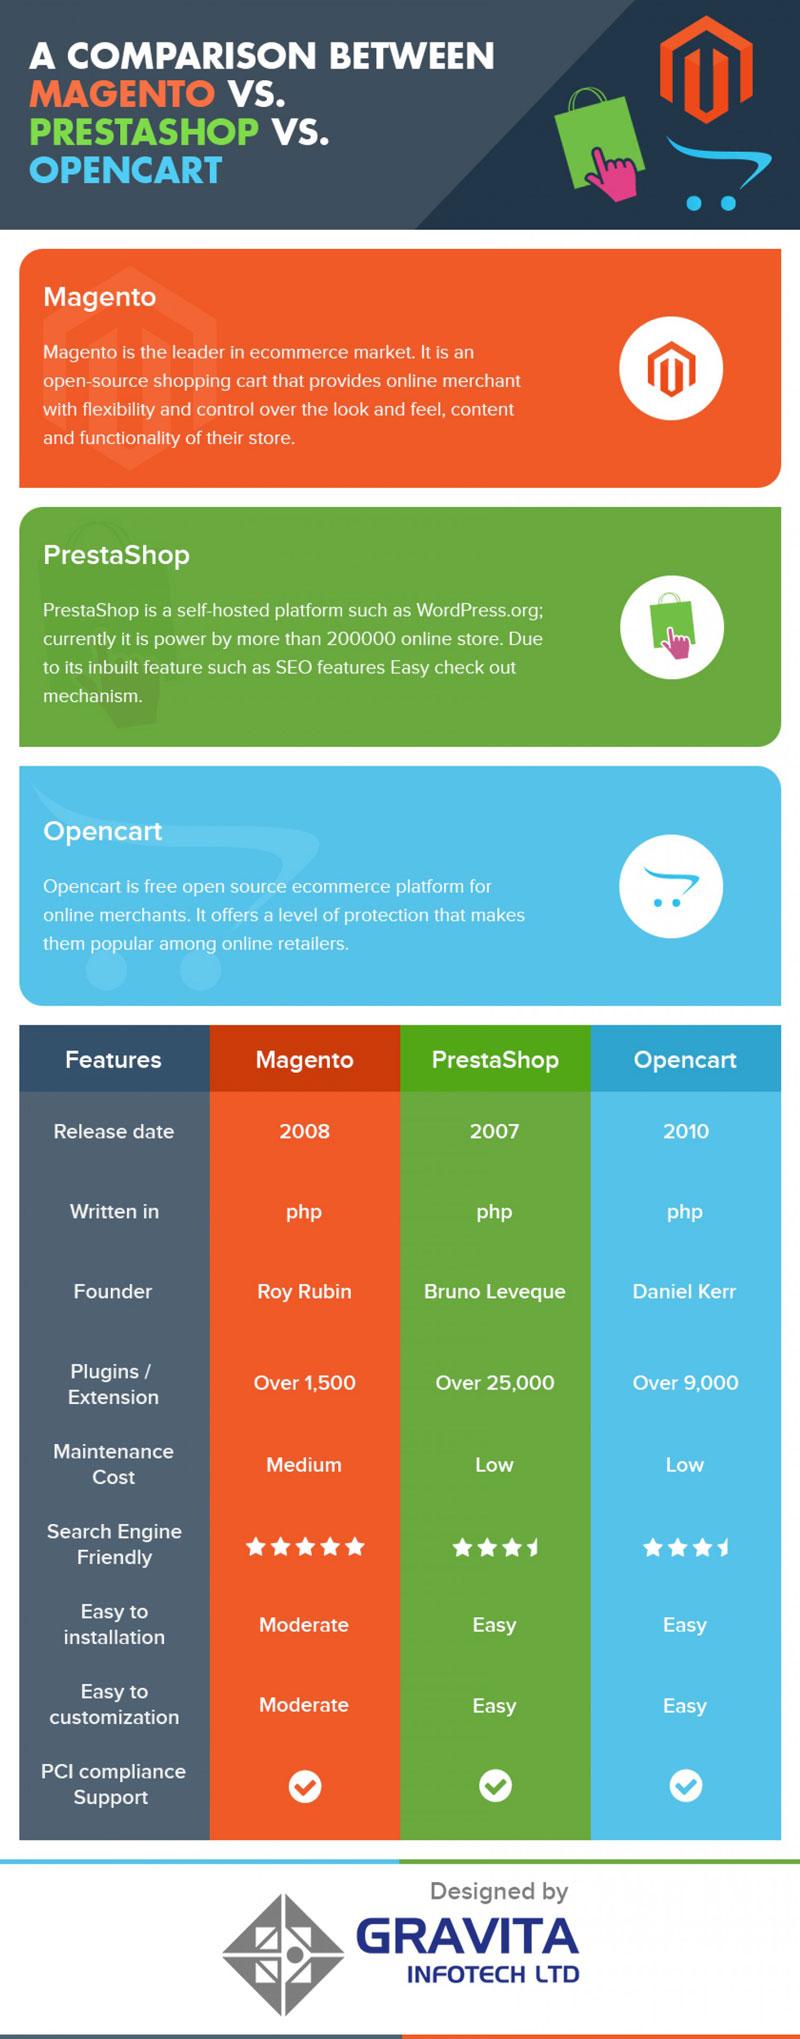 E-commerce Systems: Magento vs Prestashop vs Opencart - Infographic